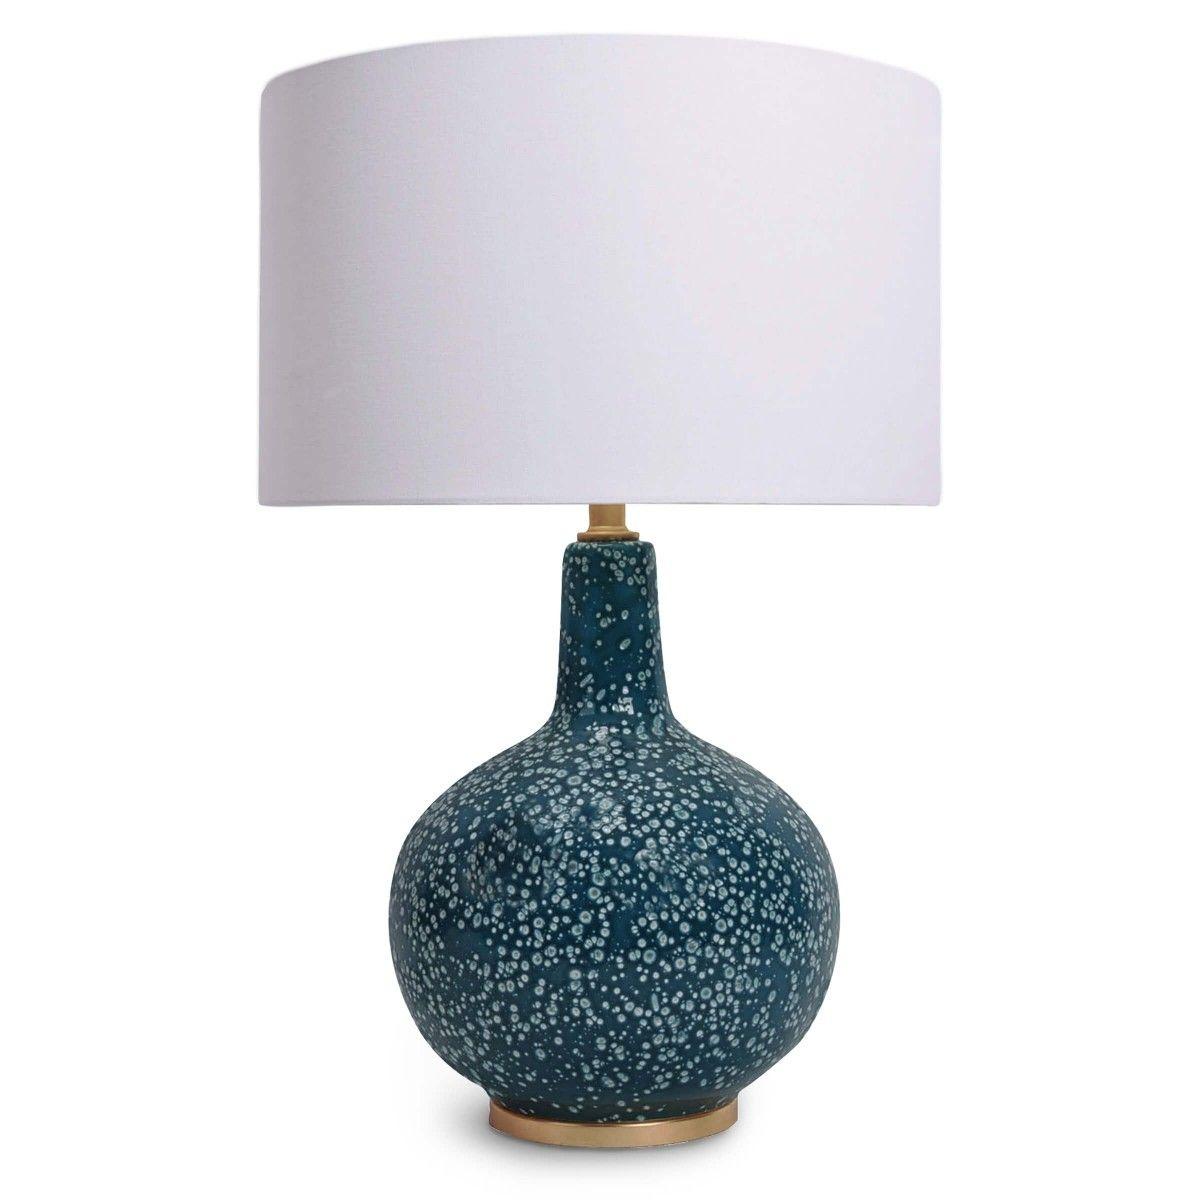 medium resolution of bulb qty 1 socket e26 3 way cast turn knob wiring type standard material ceramic finish blue